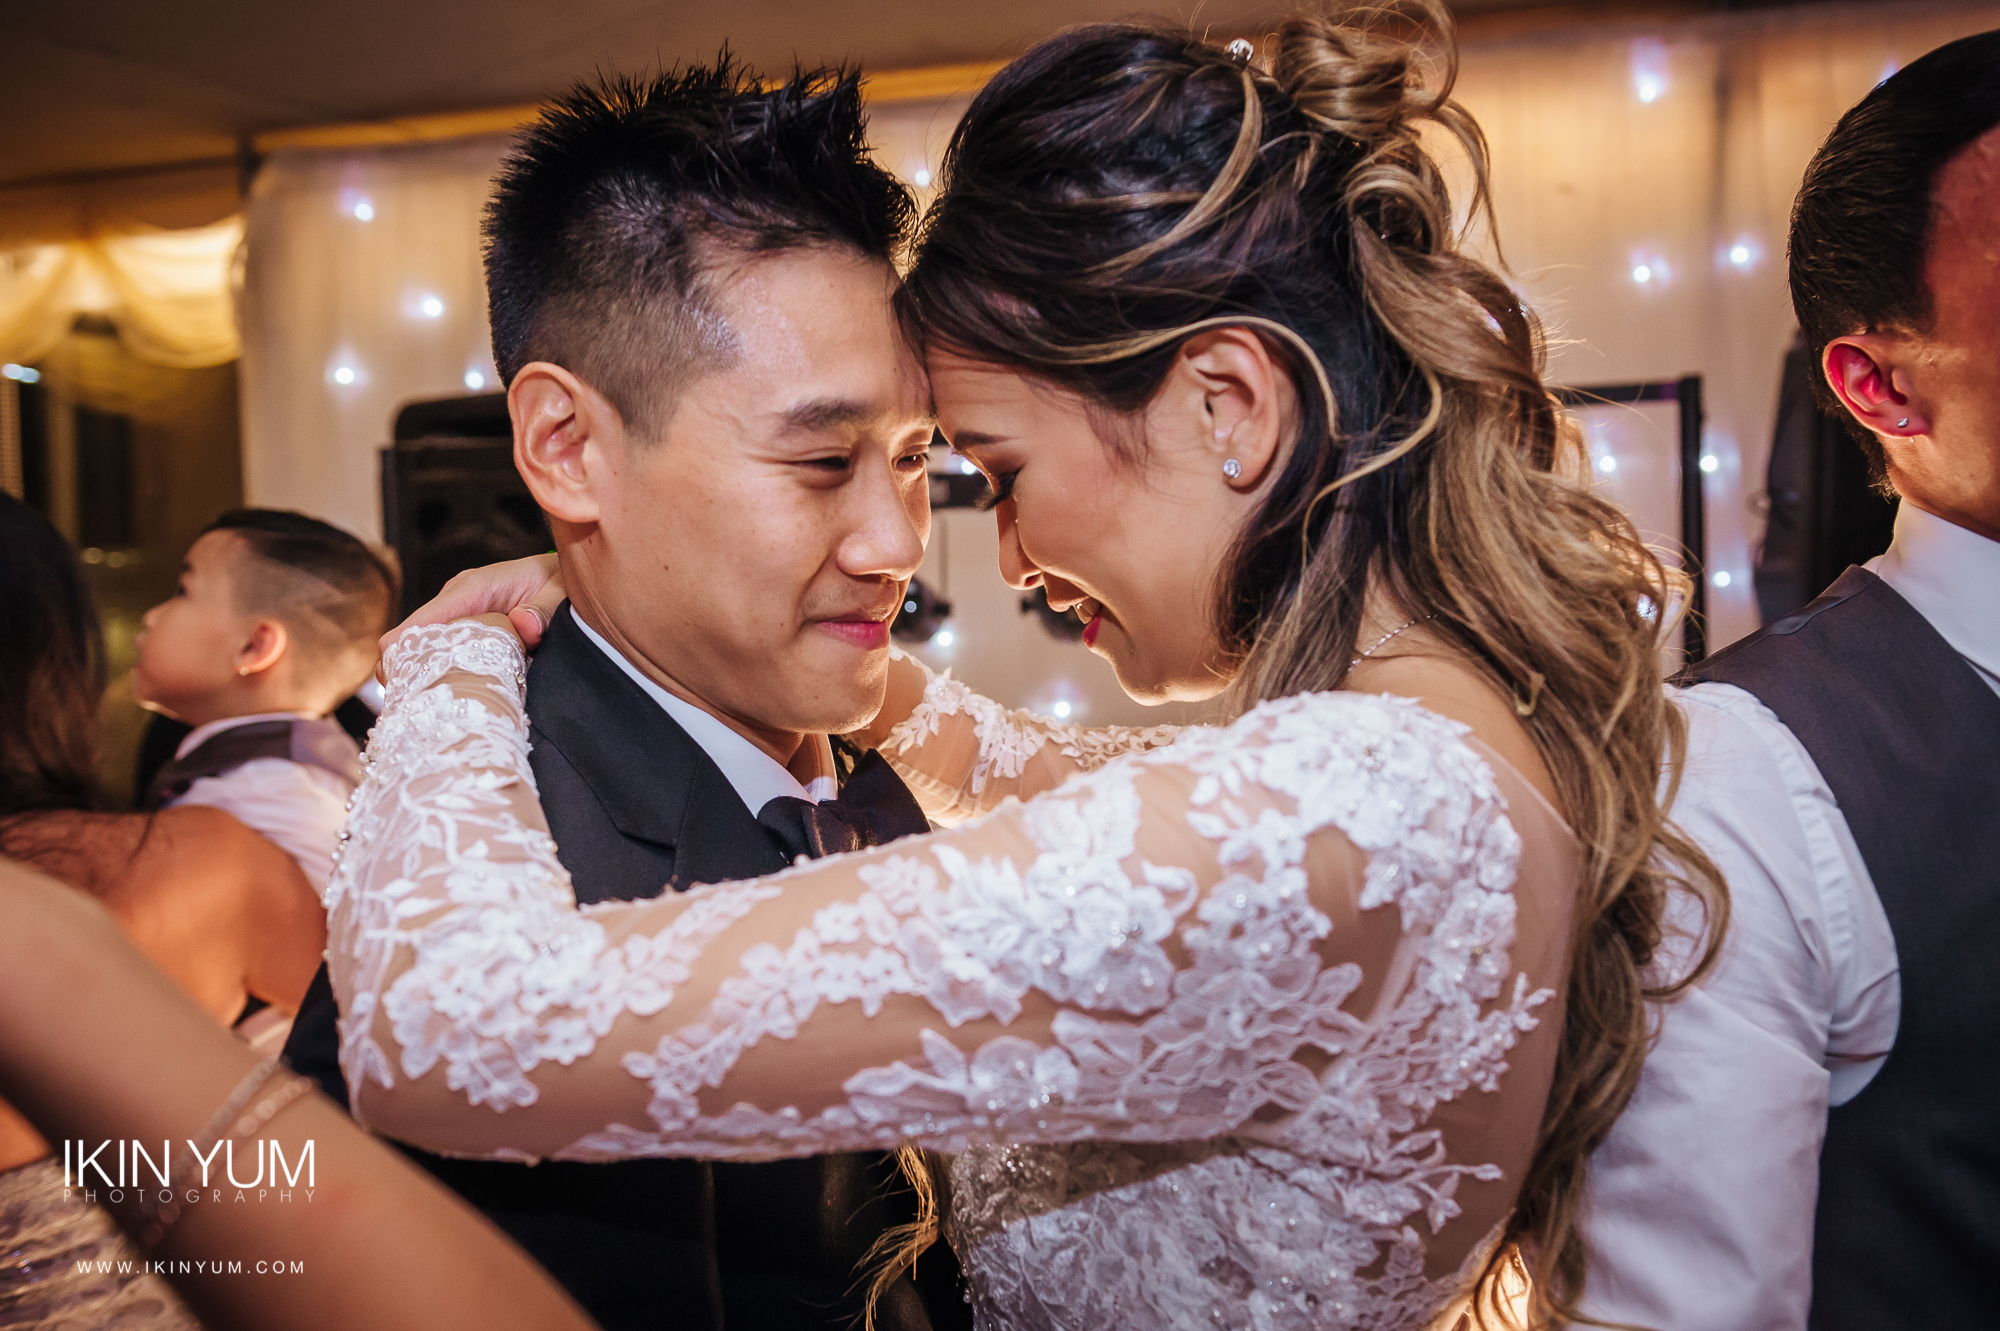 Syon Park Wedding - Ikin Yum Photography -145.jpg